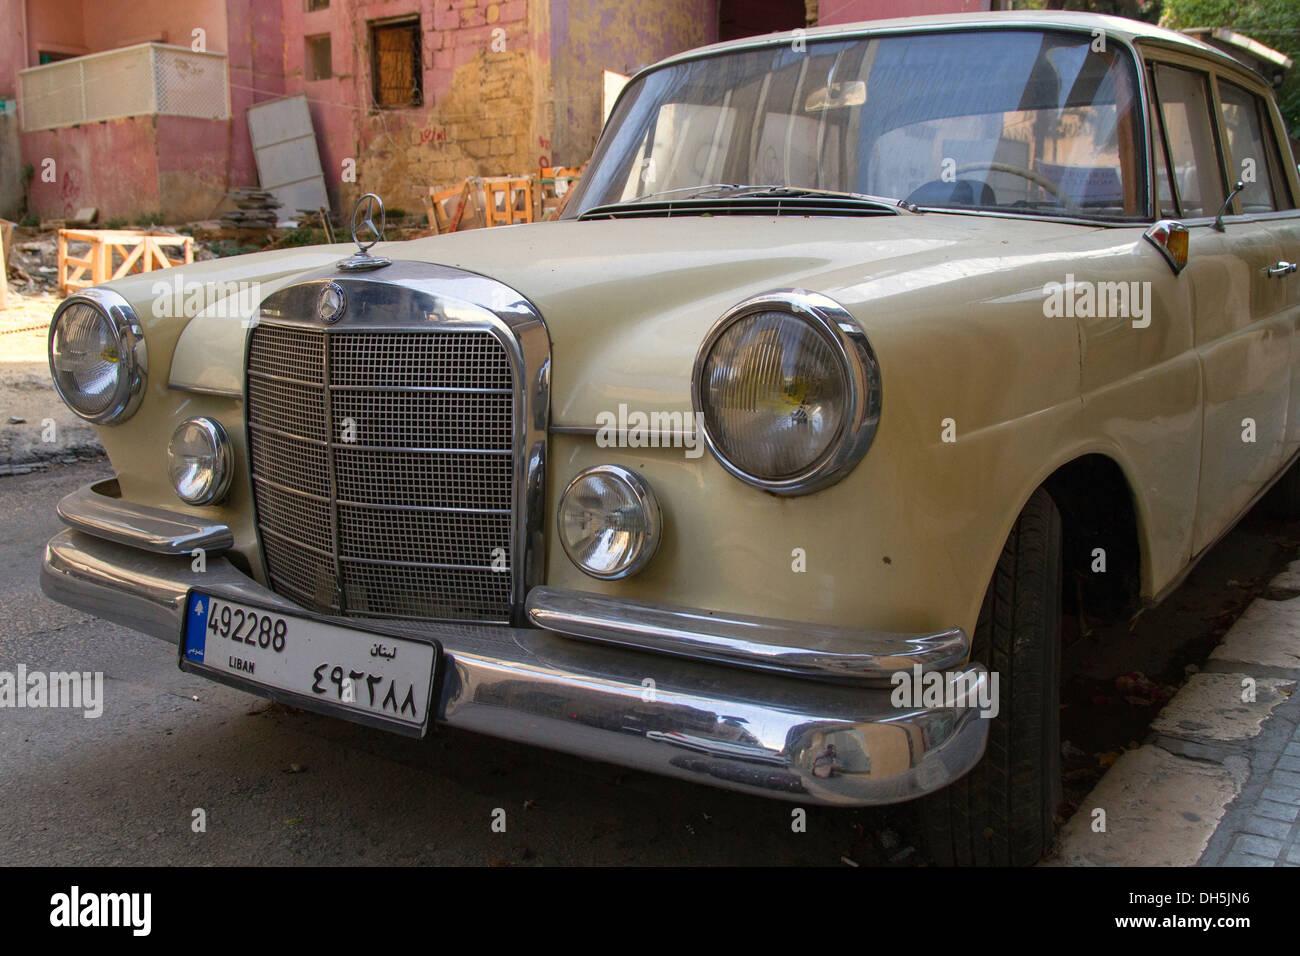 Mercedes Benz Number Plates Stock Photos & Mercedes Benz Number ...